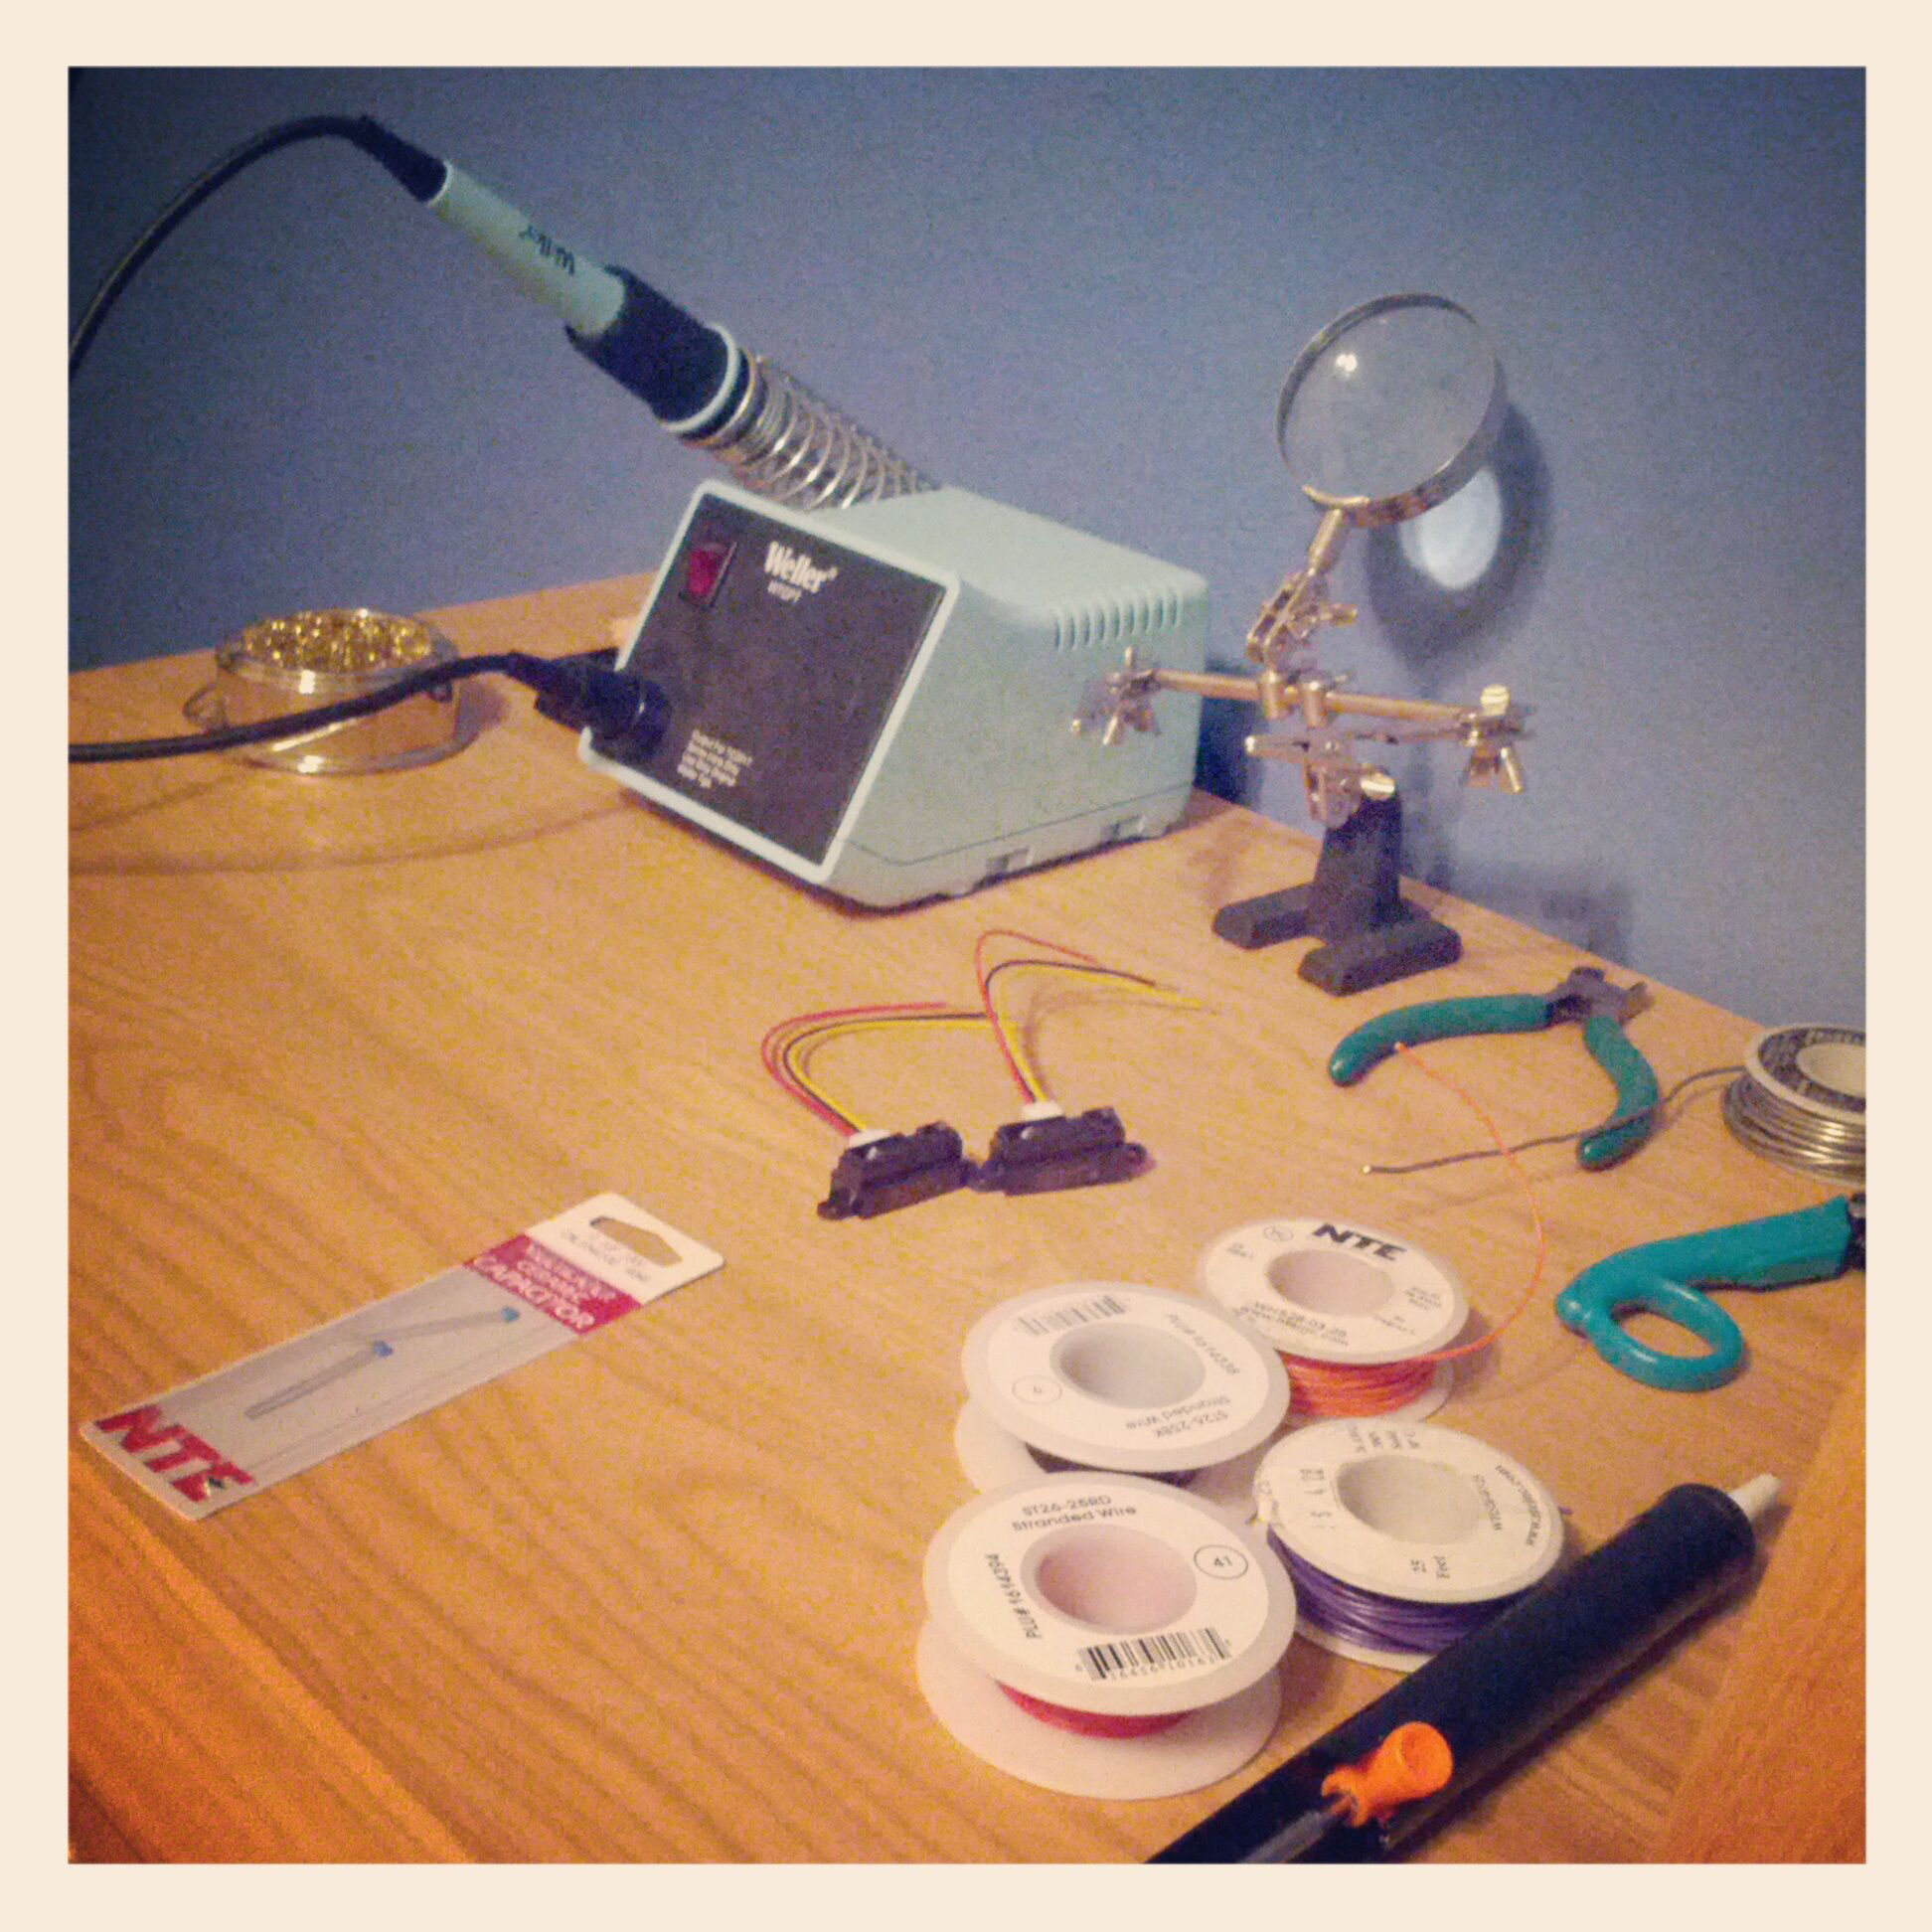 IR sensors/soldering station at home